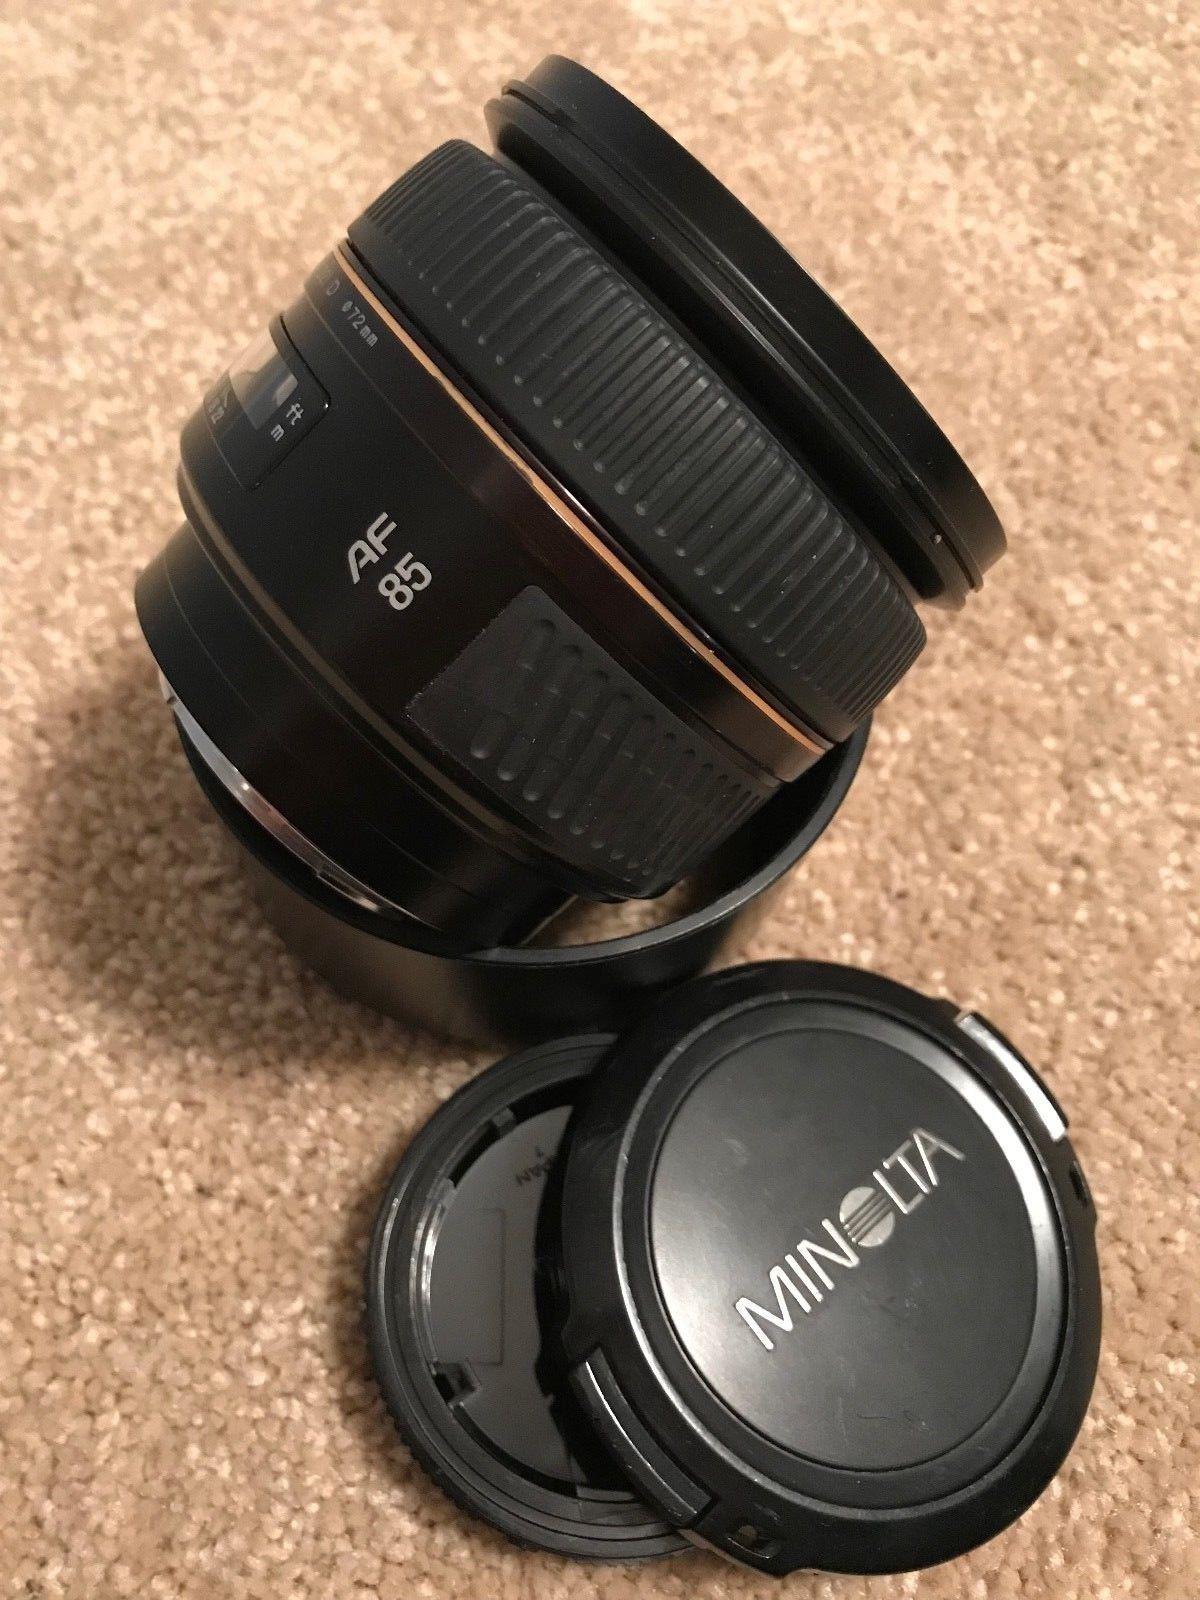 Minolta Maxxum 85mm F1 4 Af G D Camera Lens For Sony Alpha Mount